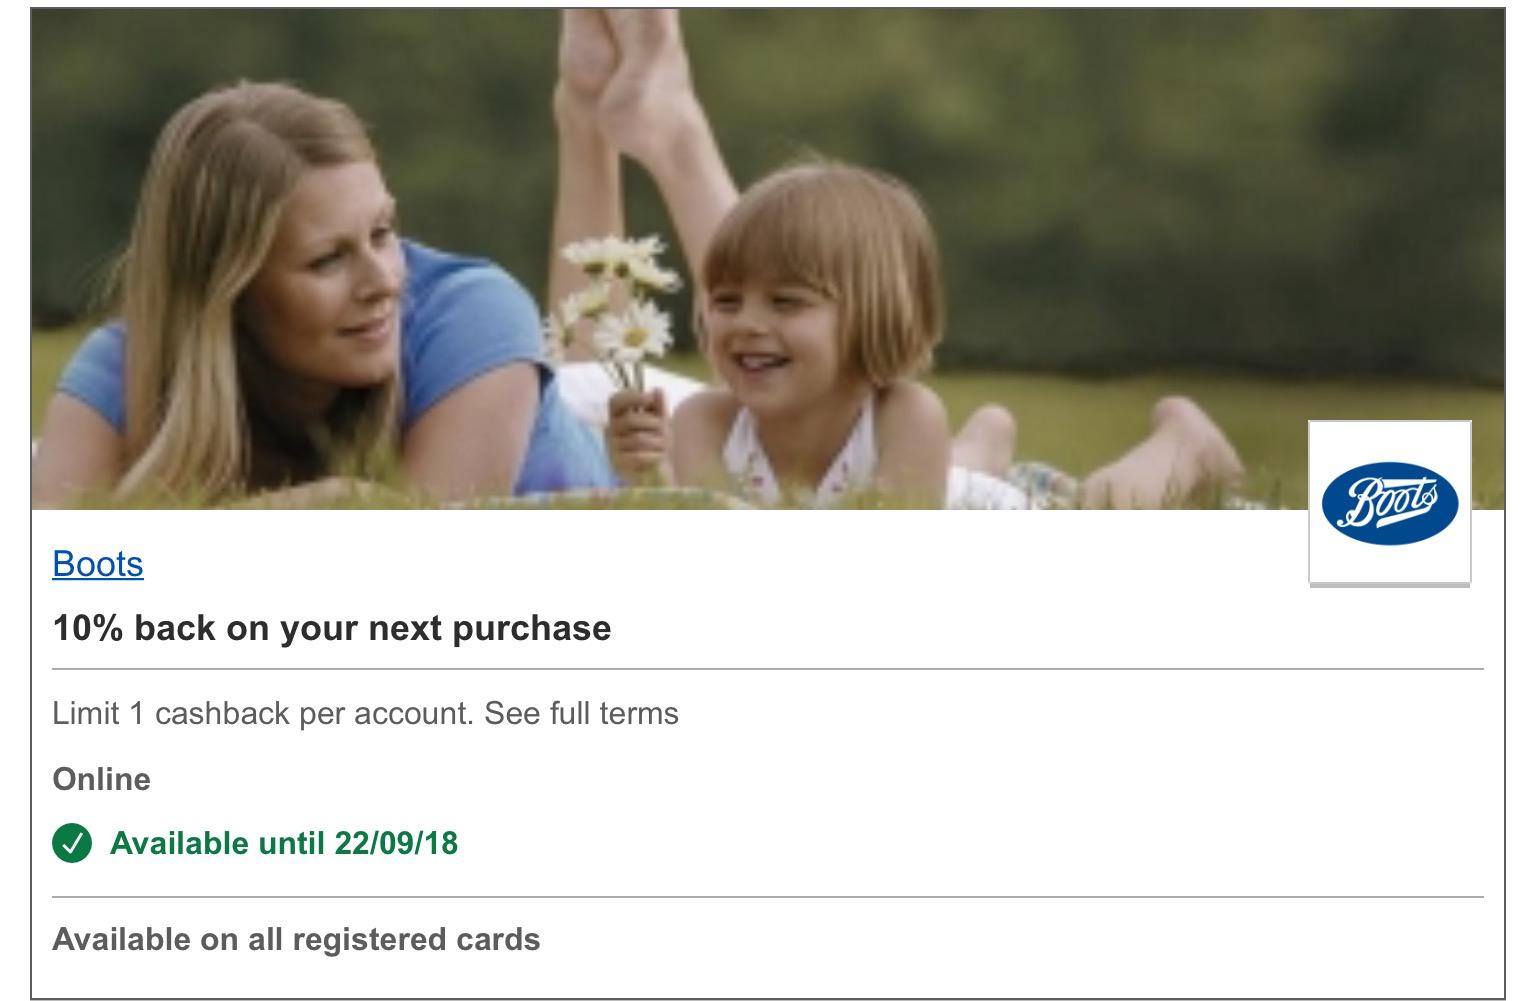 Nationwide Simply Rewards Visa offers. 10% cashback on online orders. Boots.com